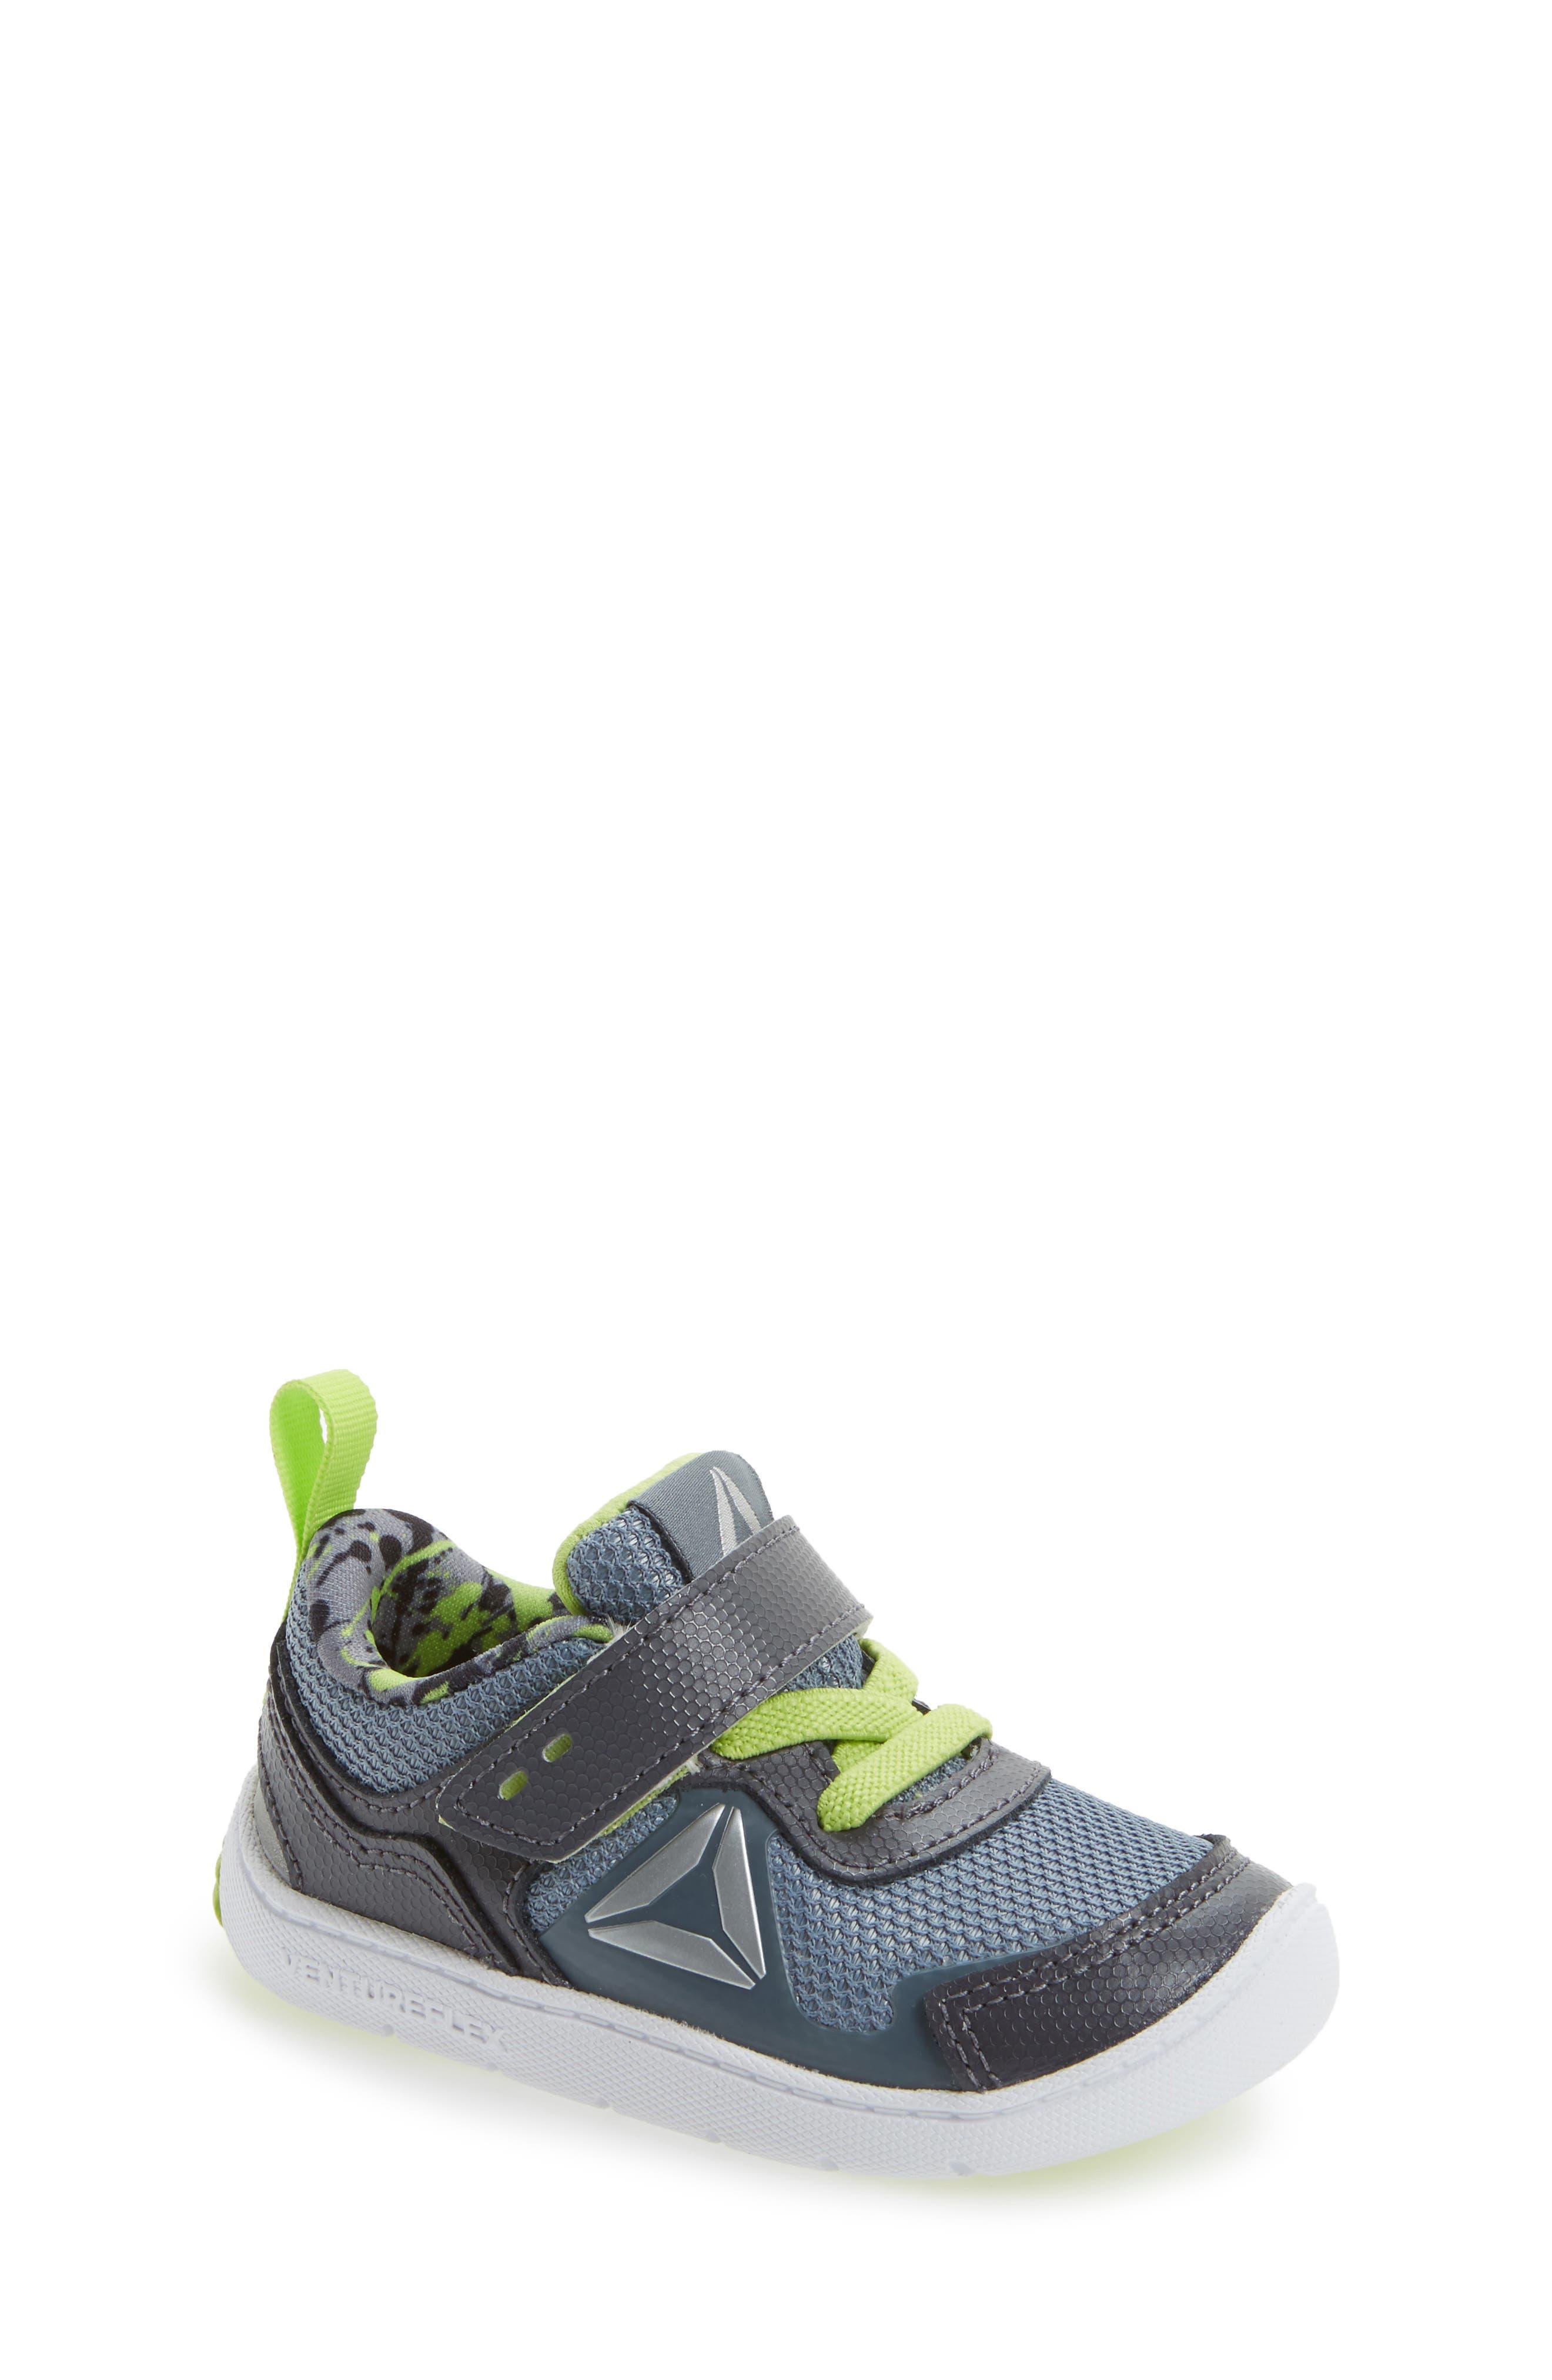 Ventureflex Stride 5.0 Sneaker,                         Main,                         color, 020